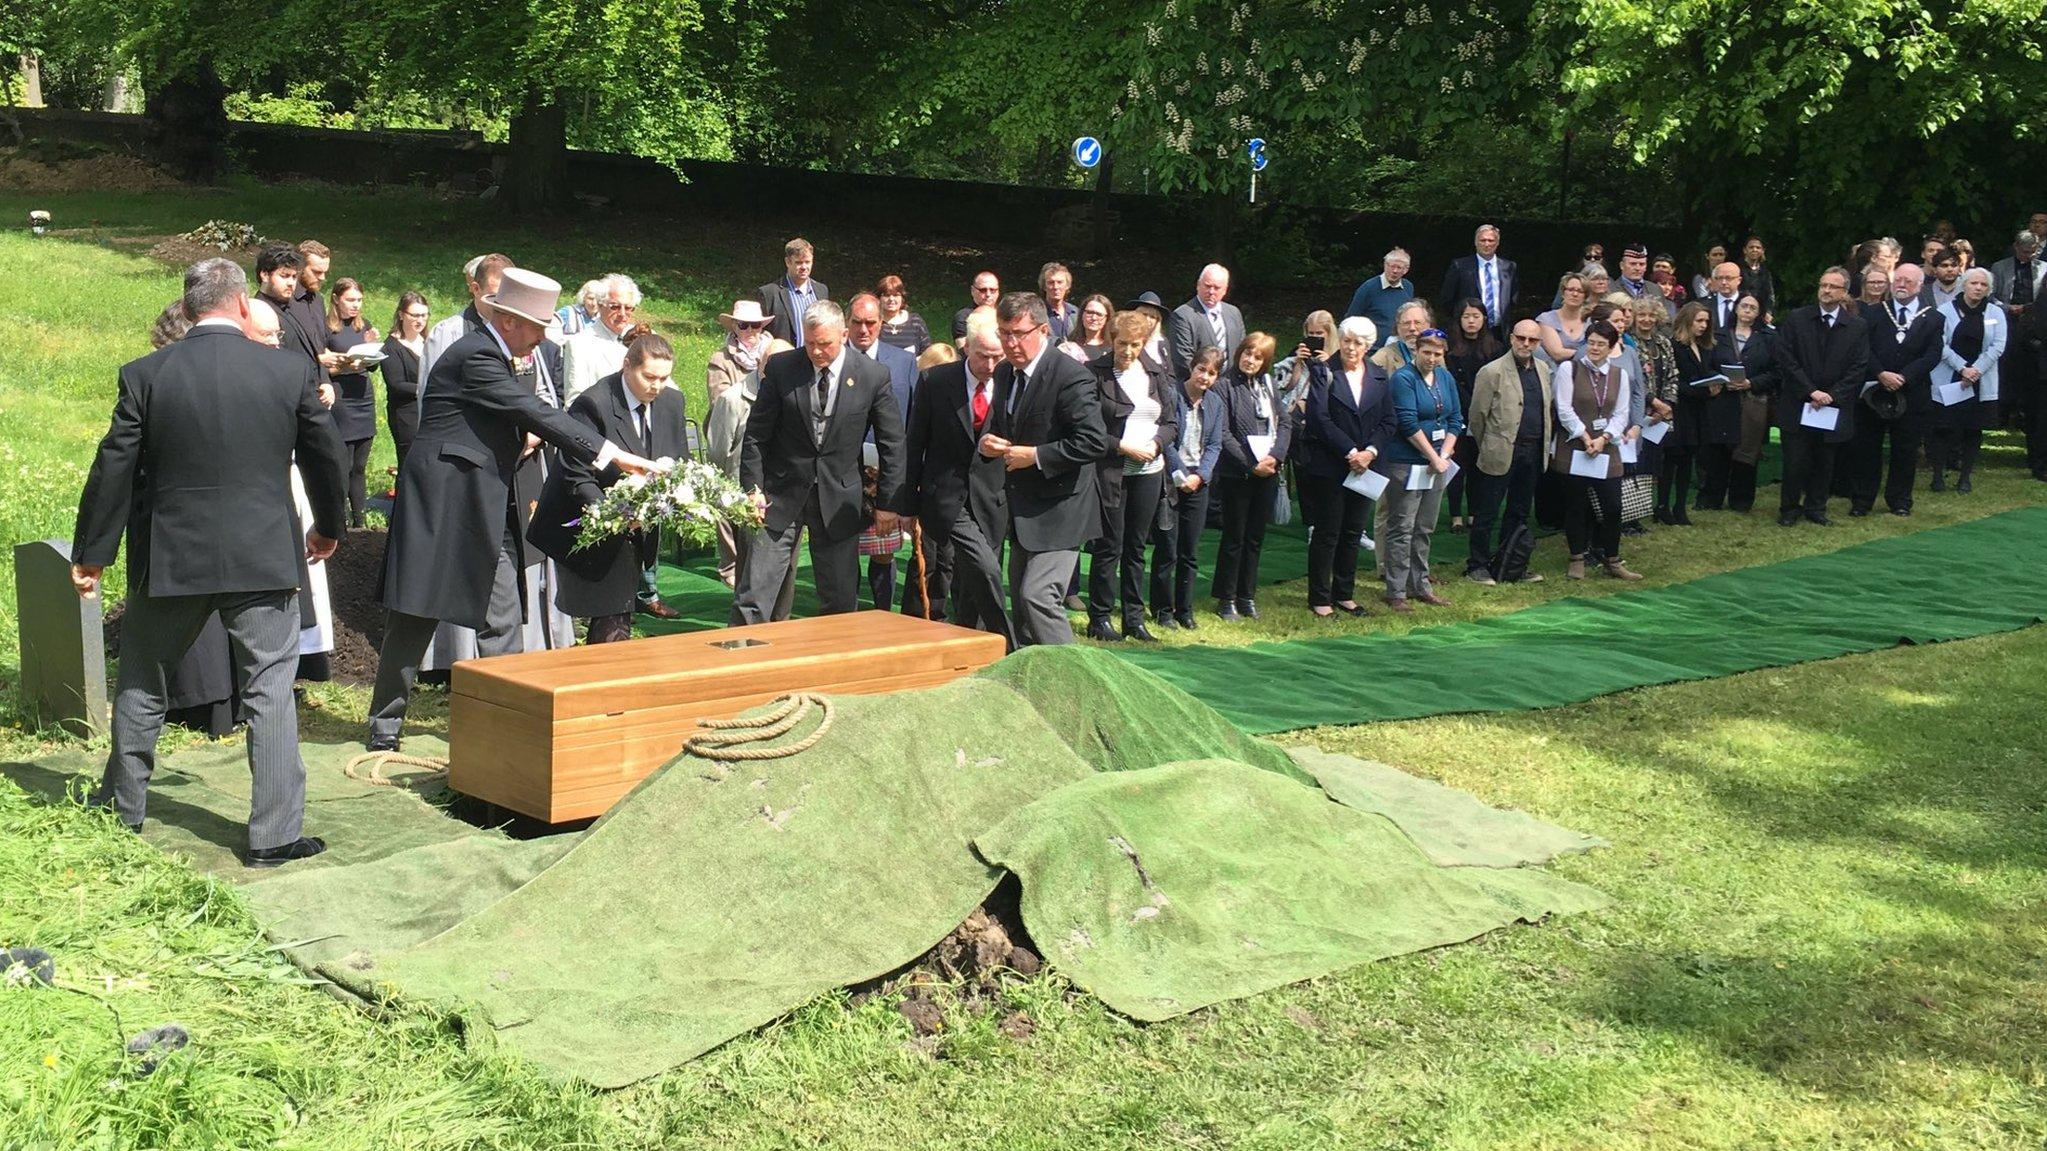 Scottish soil for Civil War POW Durham reburial